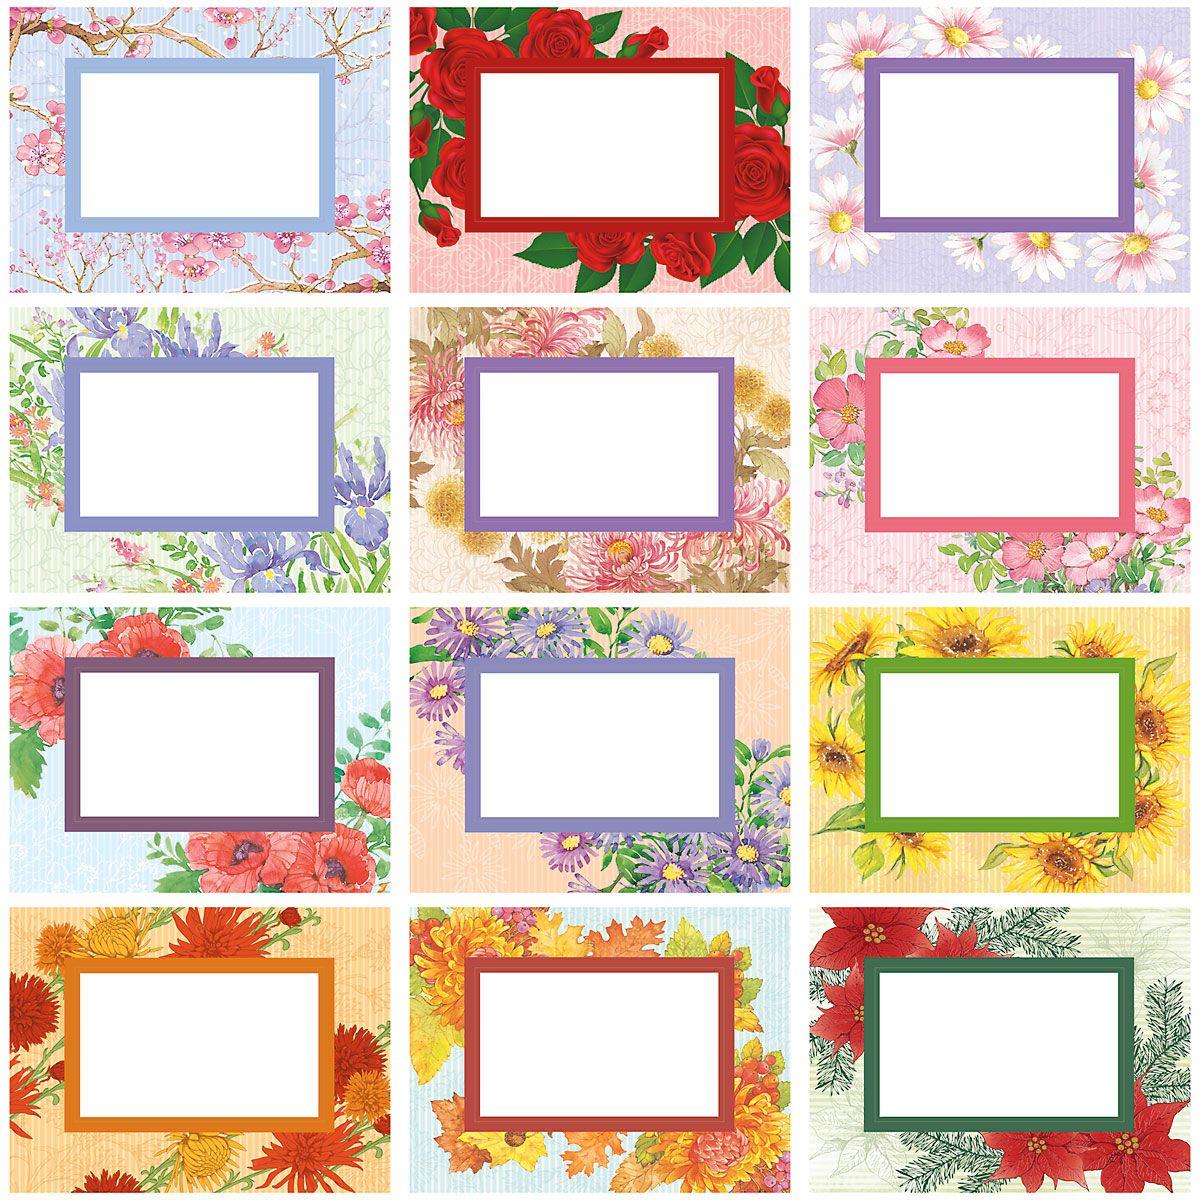 2018 Floral Photo Calendar